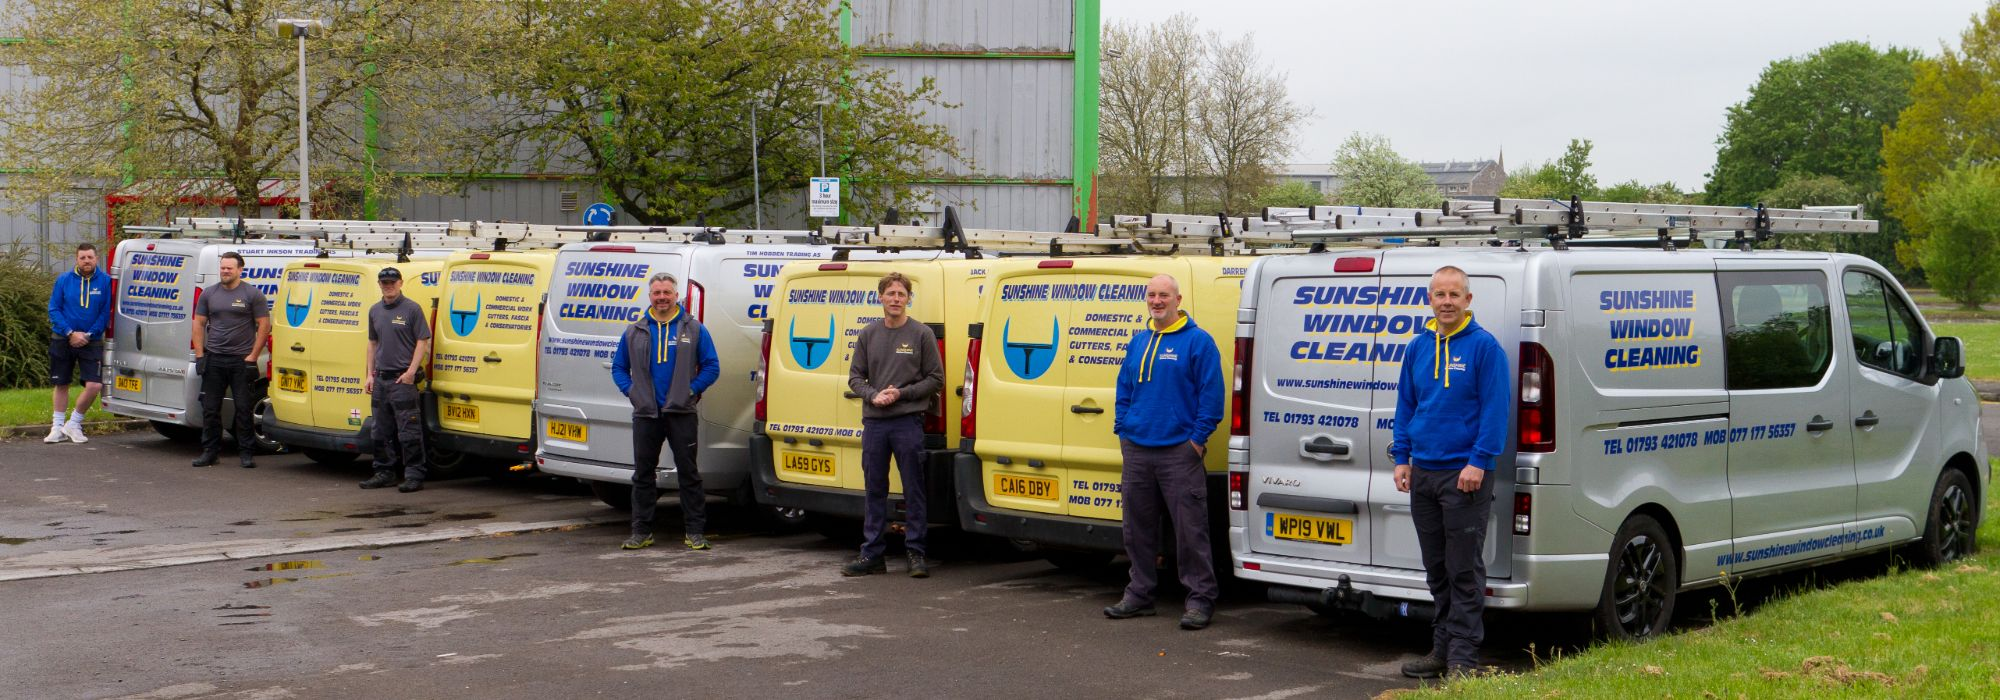 best window cleaning company in swindon wiltshire